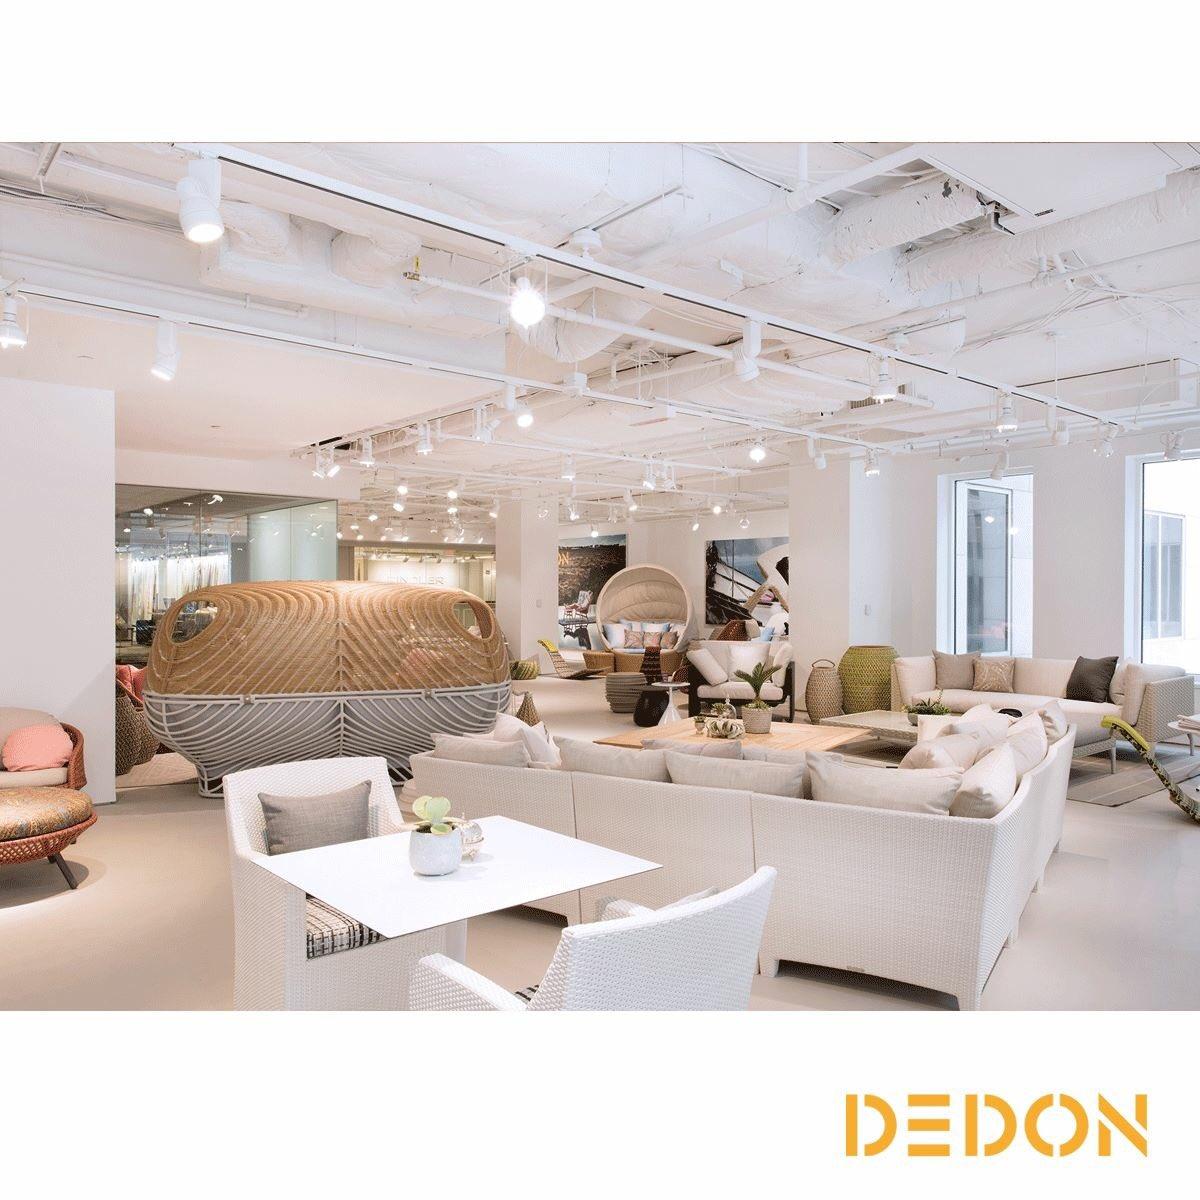 Dedon Lüneburg dedon on the doors of our newest showroom in washington